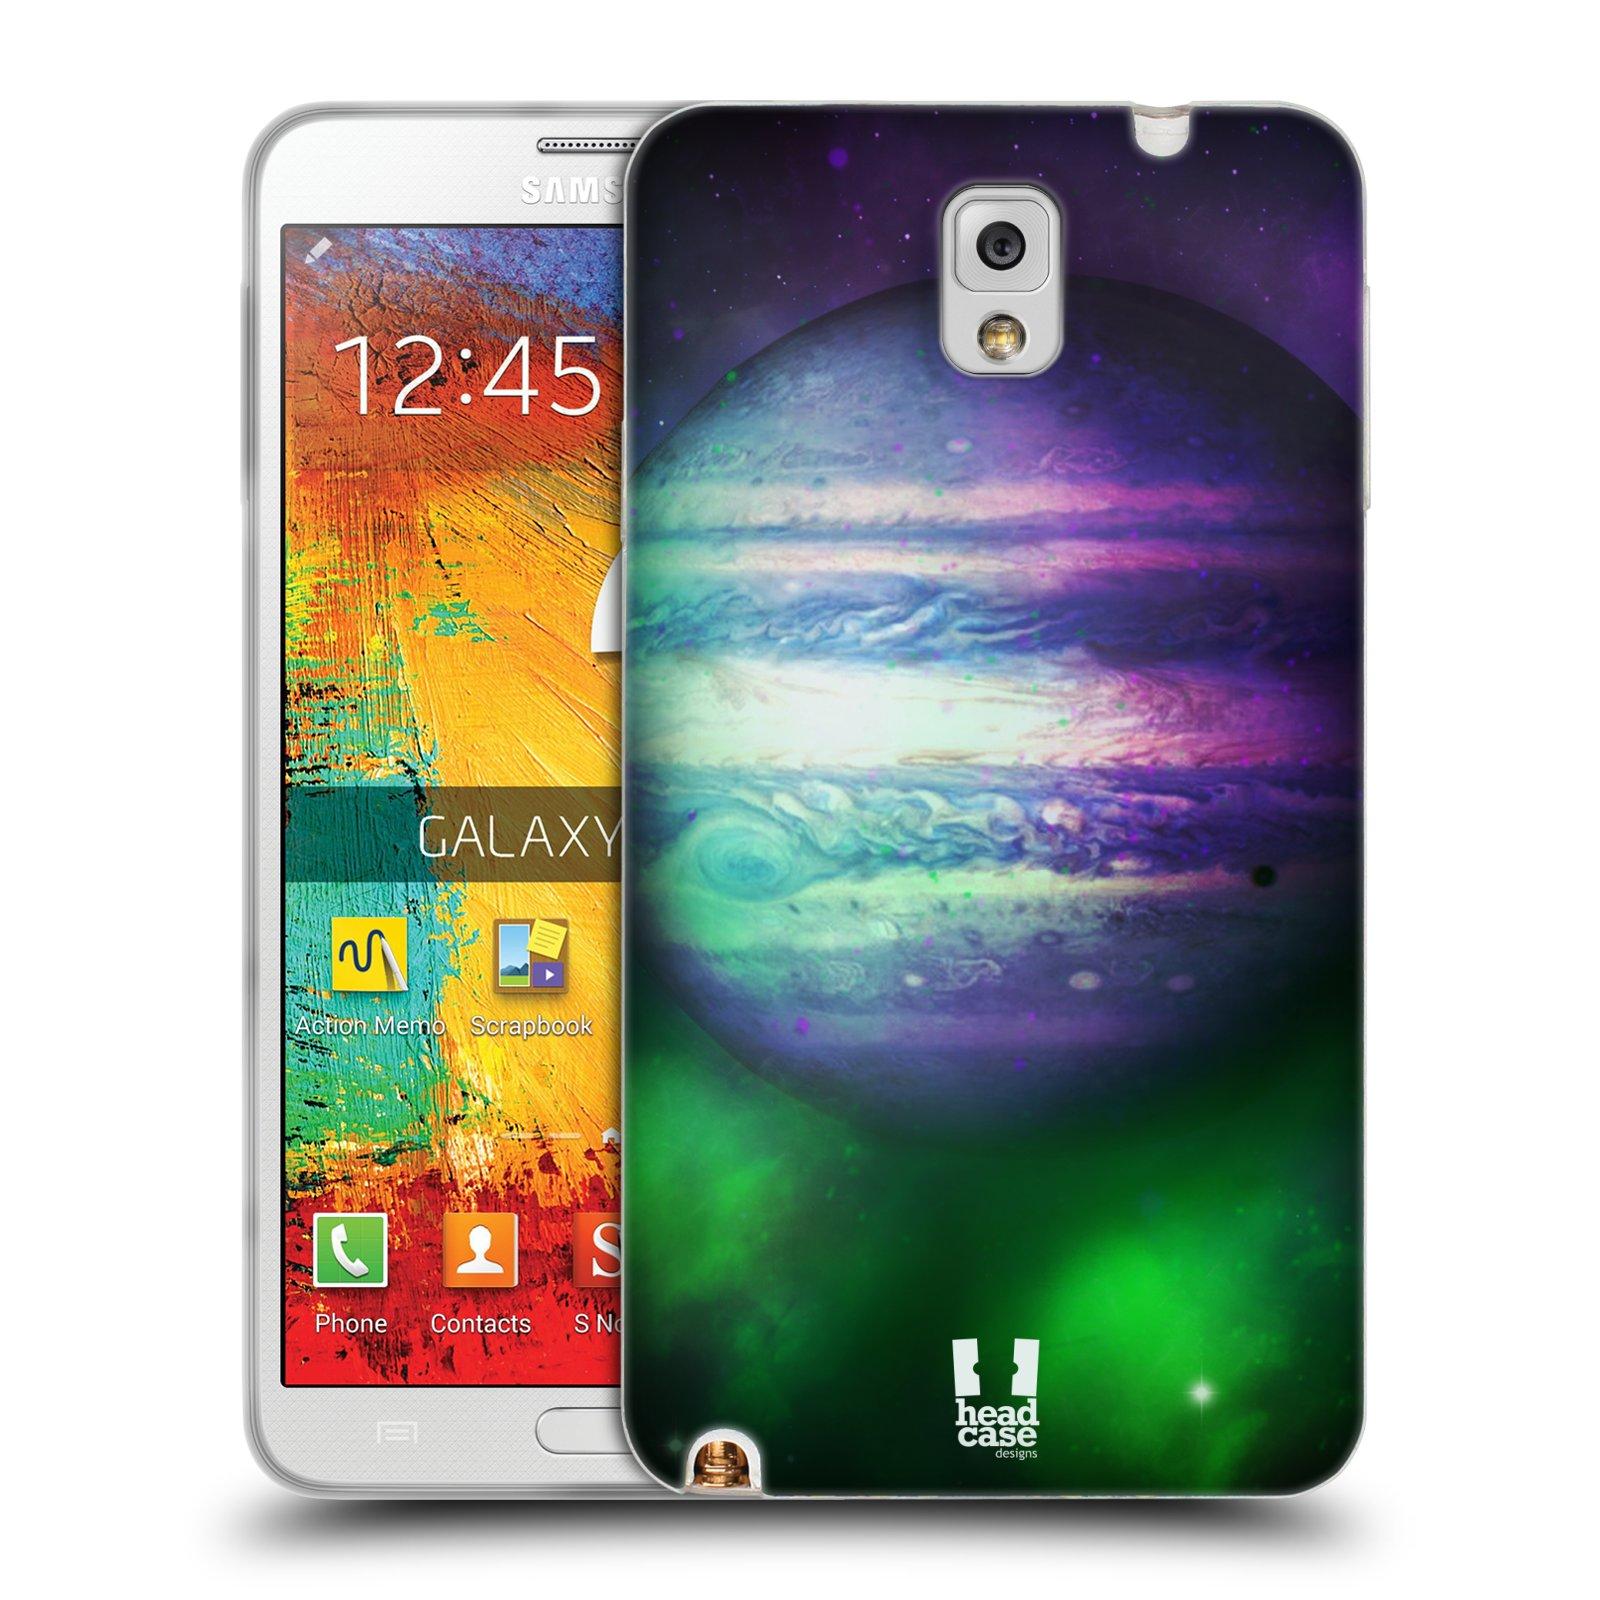 HEAD CASE DESIGNS SPACE WONDERS SET1 SOFT GEL CASE FOR SAMSUNG PHONES 2